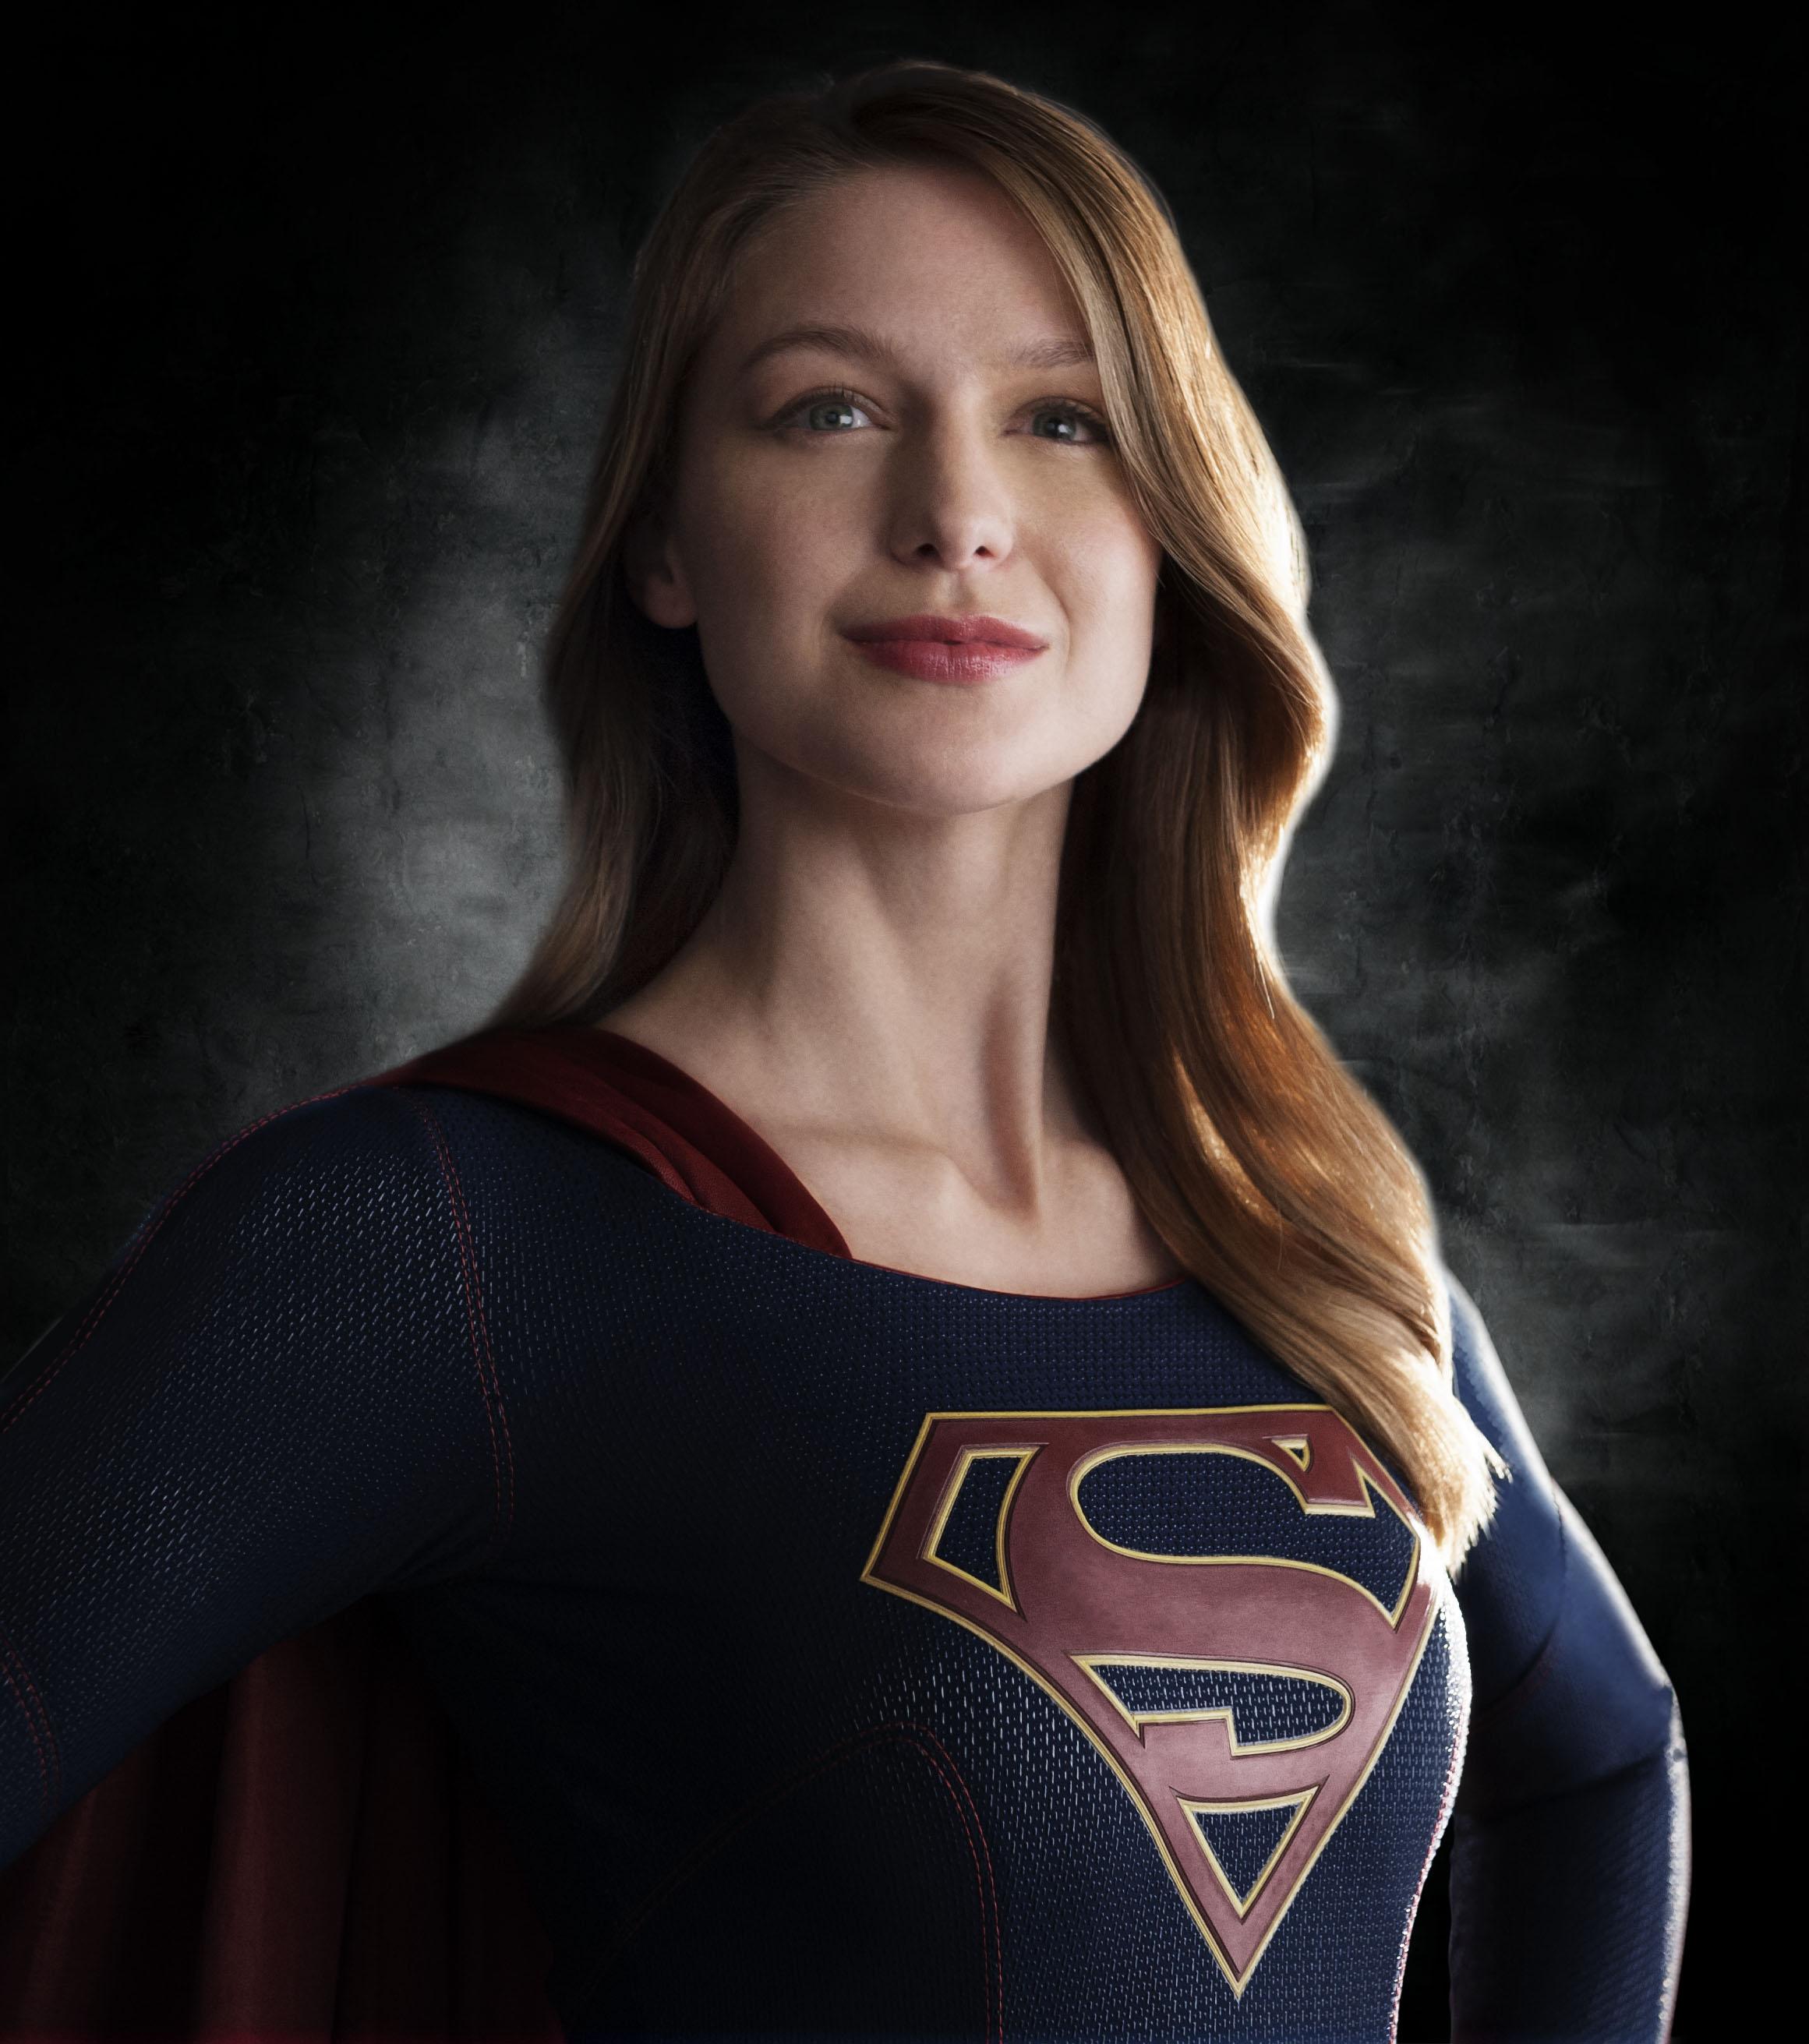 HQ Super Girl Wallpapers | File 631.62Kb